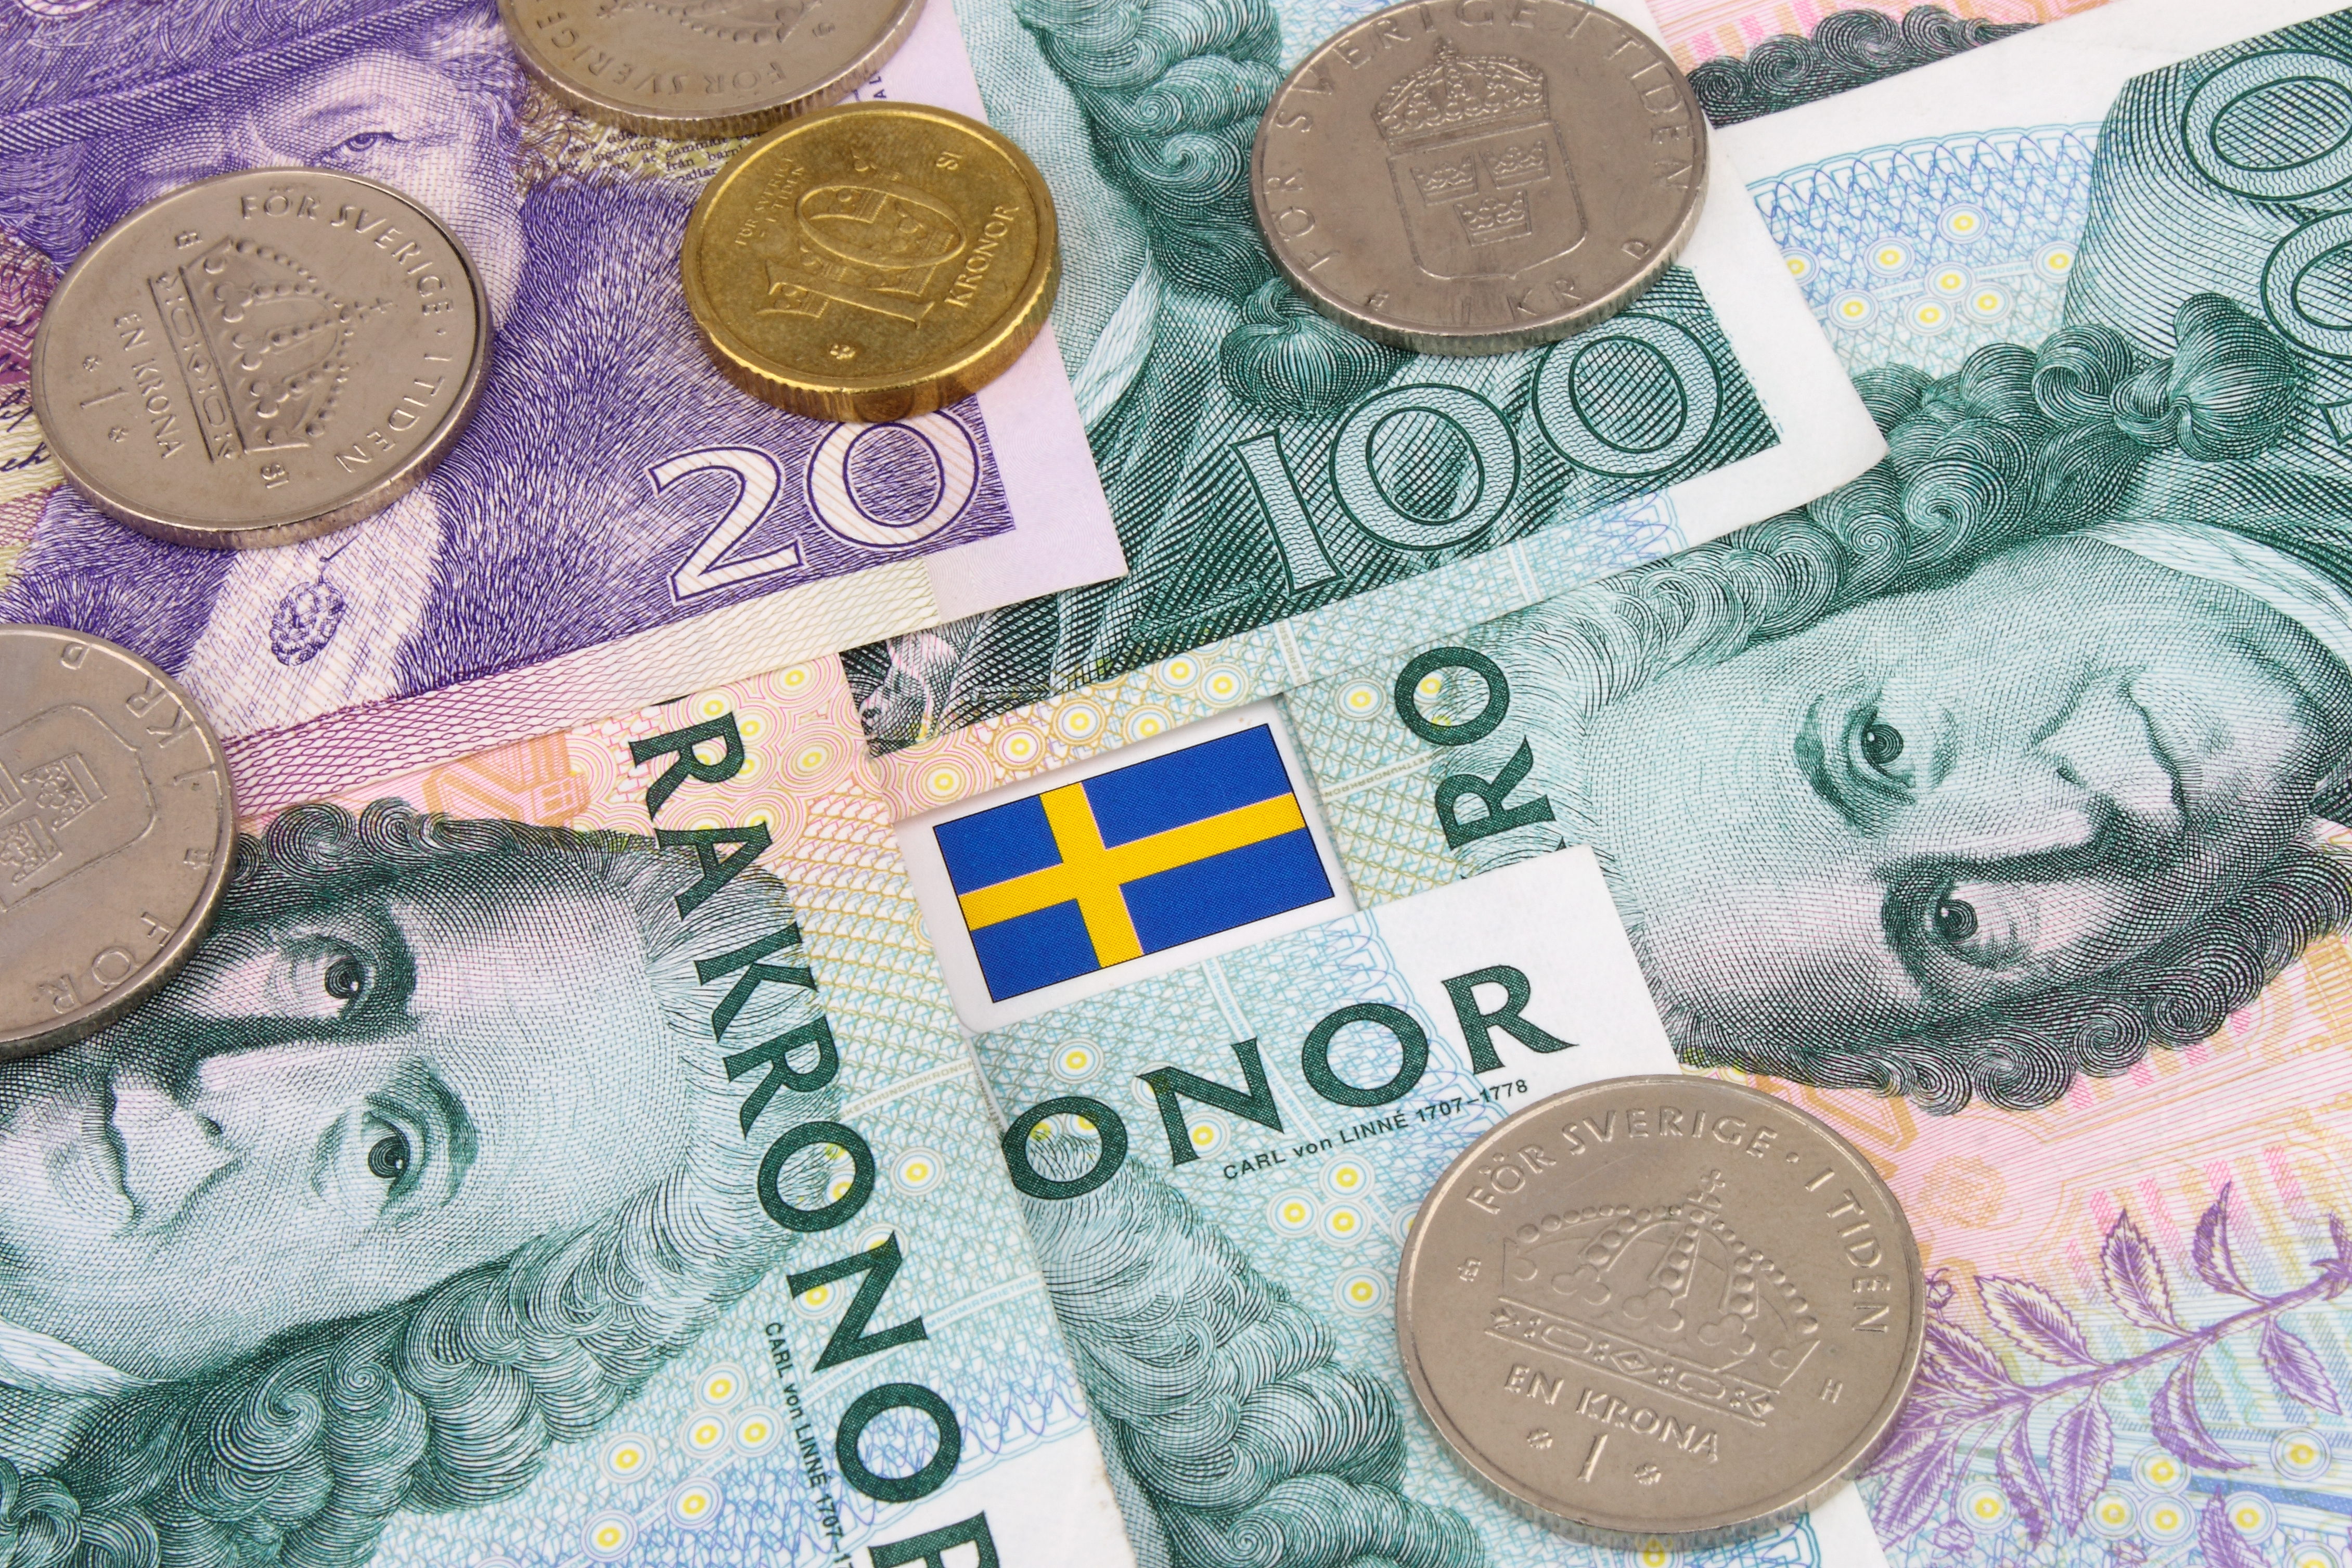 A lack of precedent leads Swedish court to return 33 BTC after law enforcement seizure